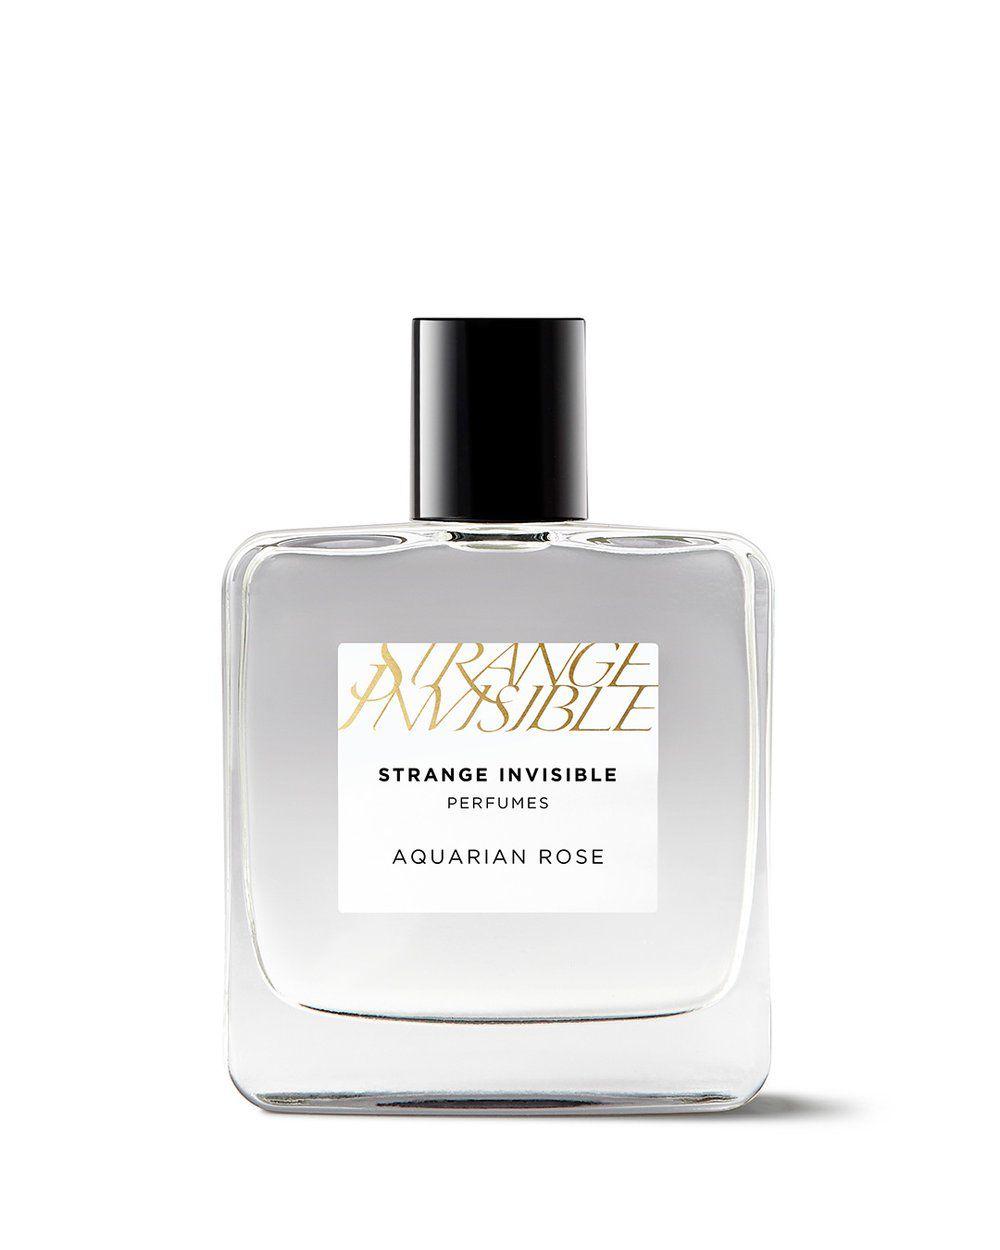 Strange Invisible Perfumes Aquarian Rose